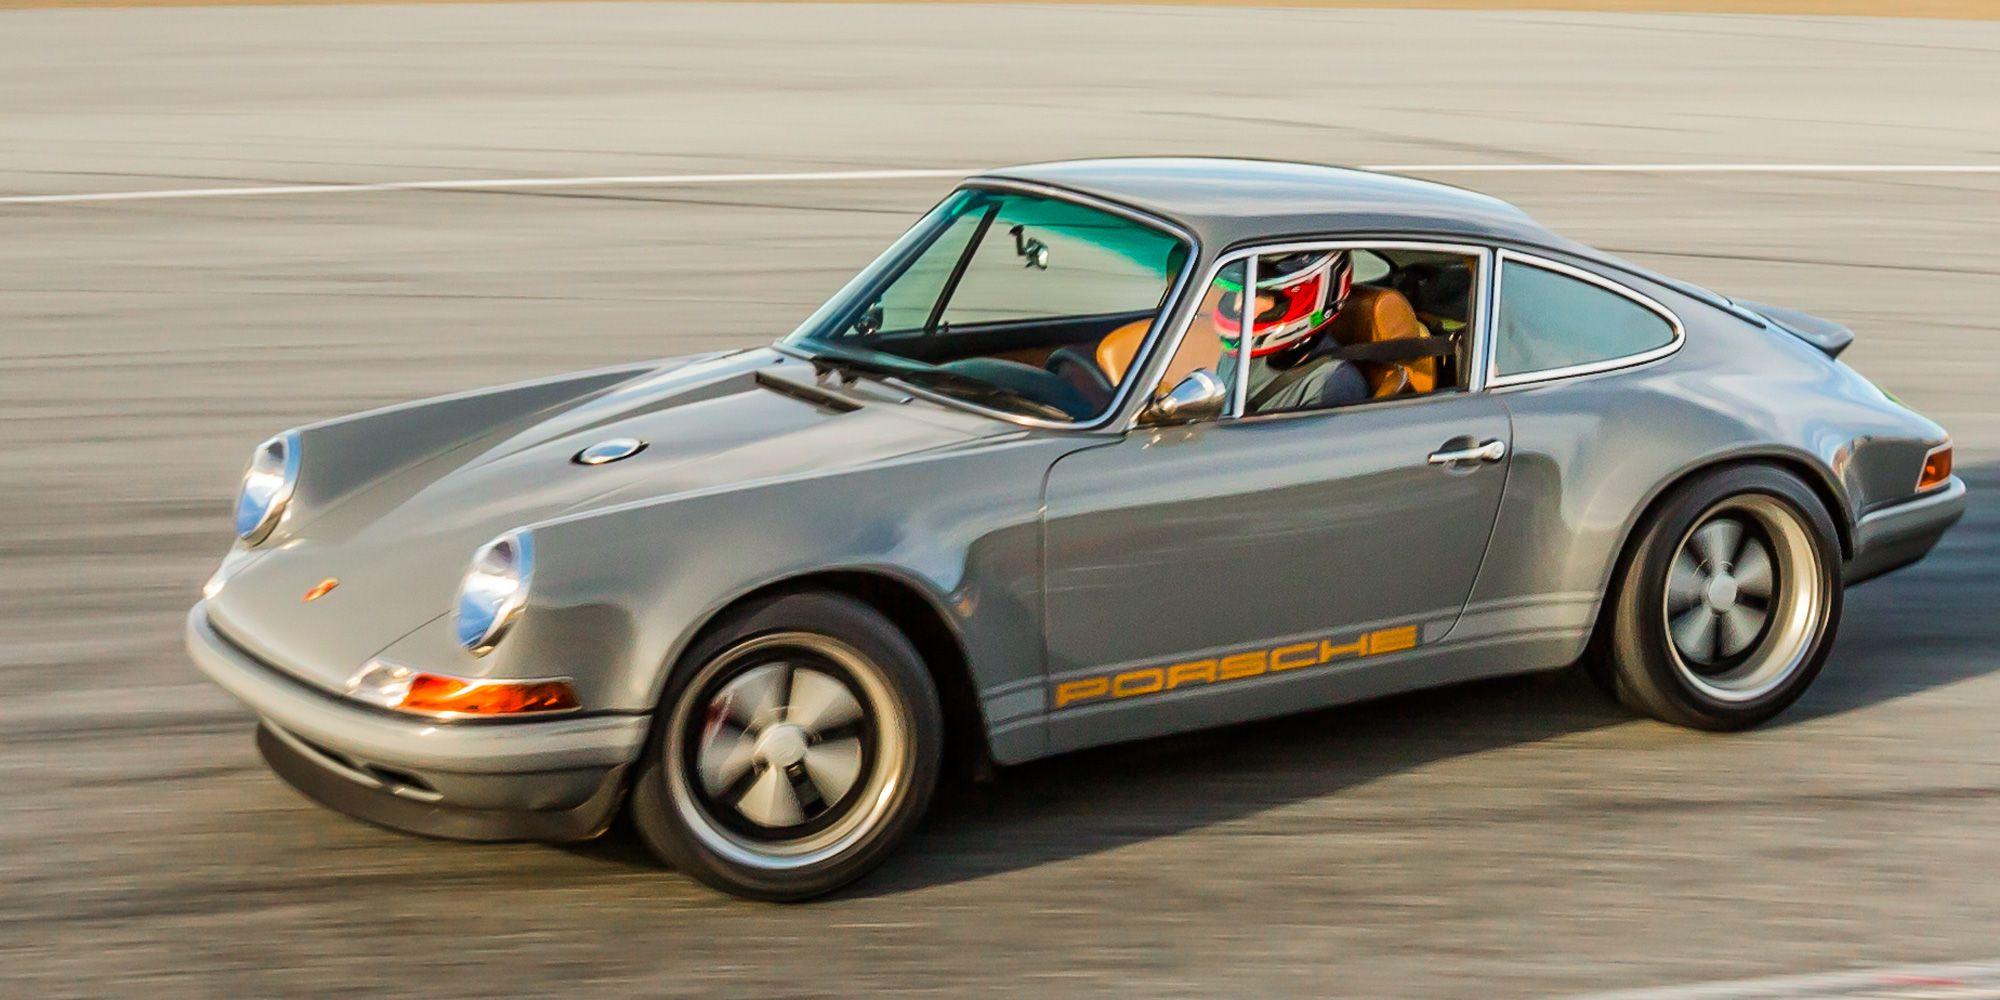 Flat Sex Porsche 911 Reimagined By Singer Wiring Harness Cost